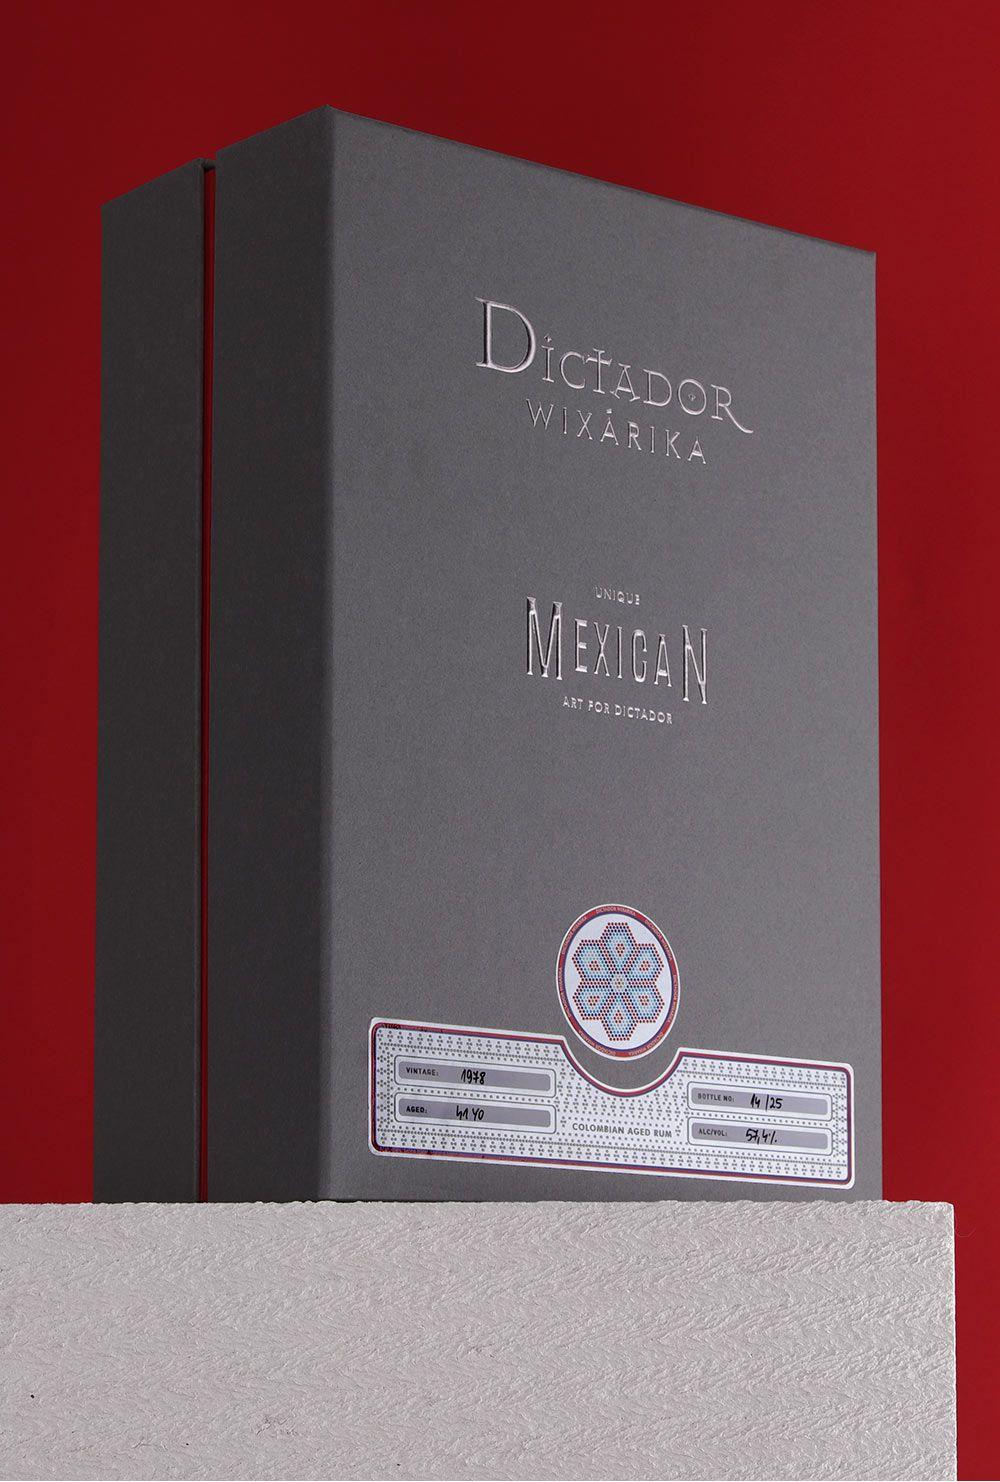 Dictador Wixarika - Model 2018/4